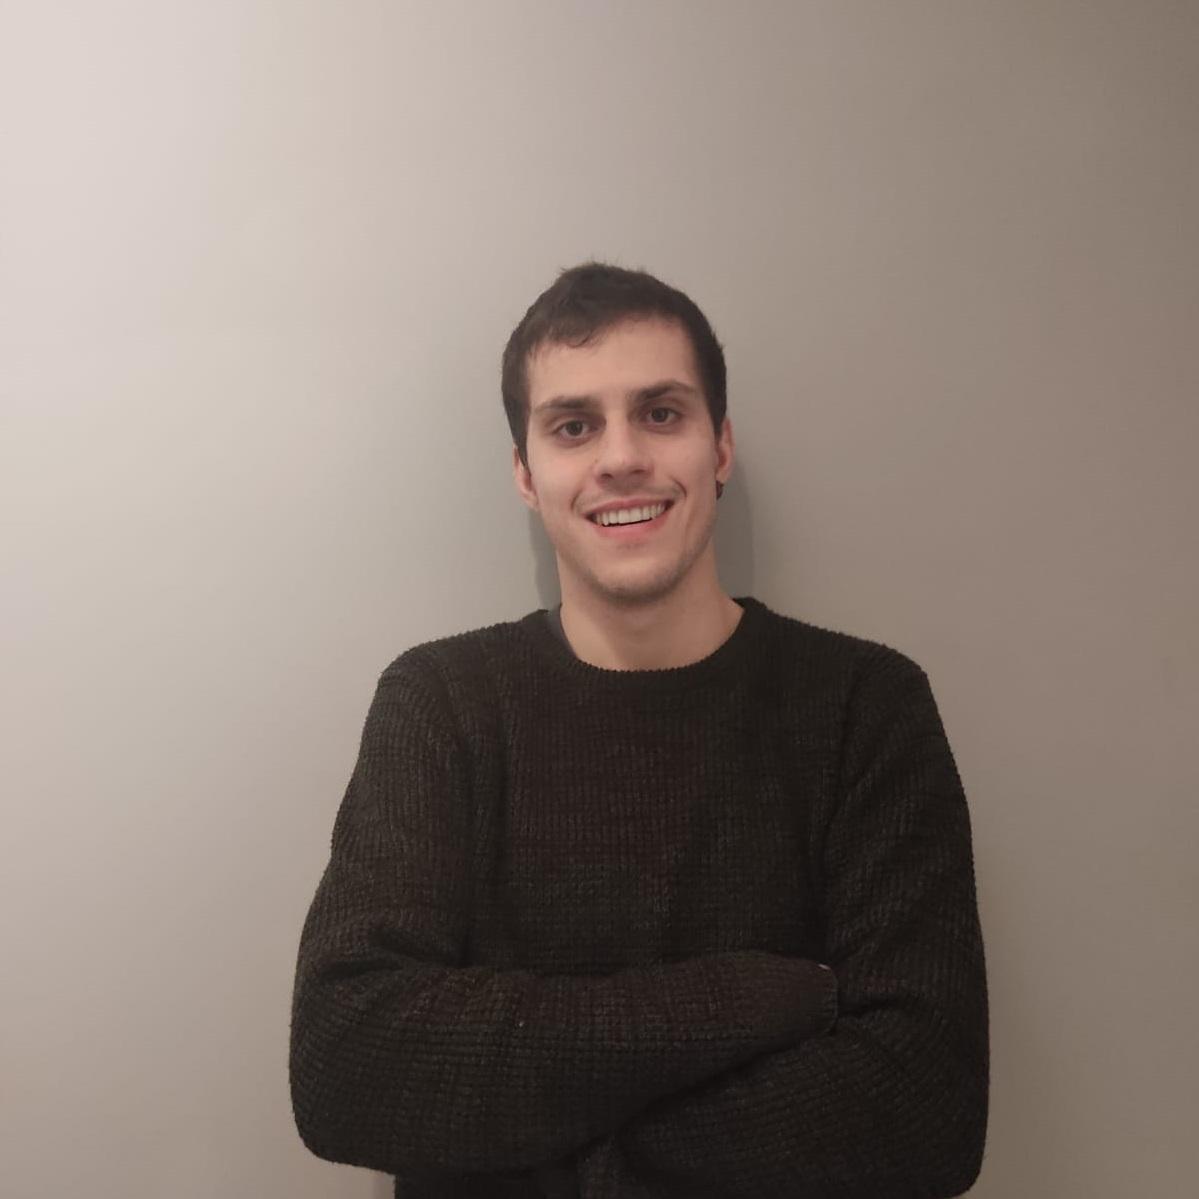 Marc Serulla